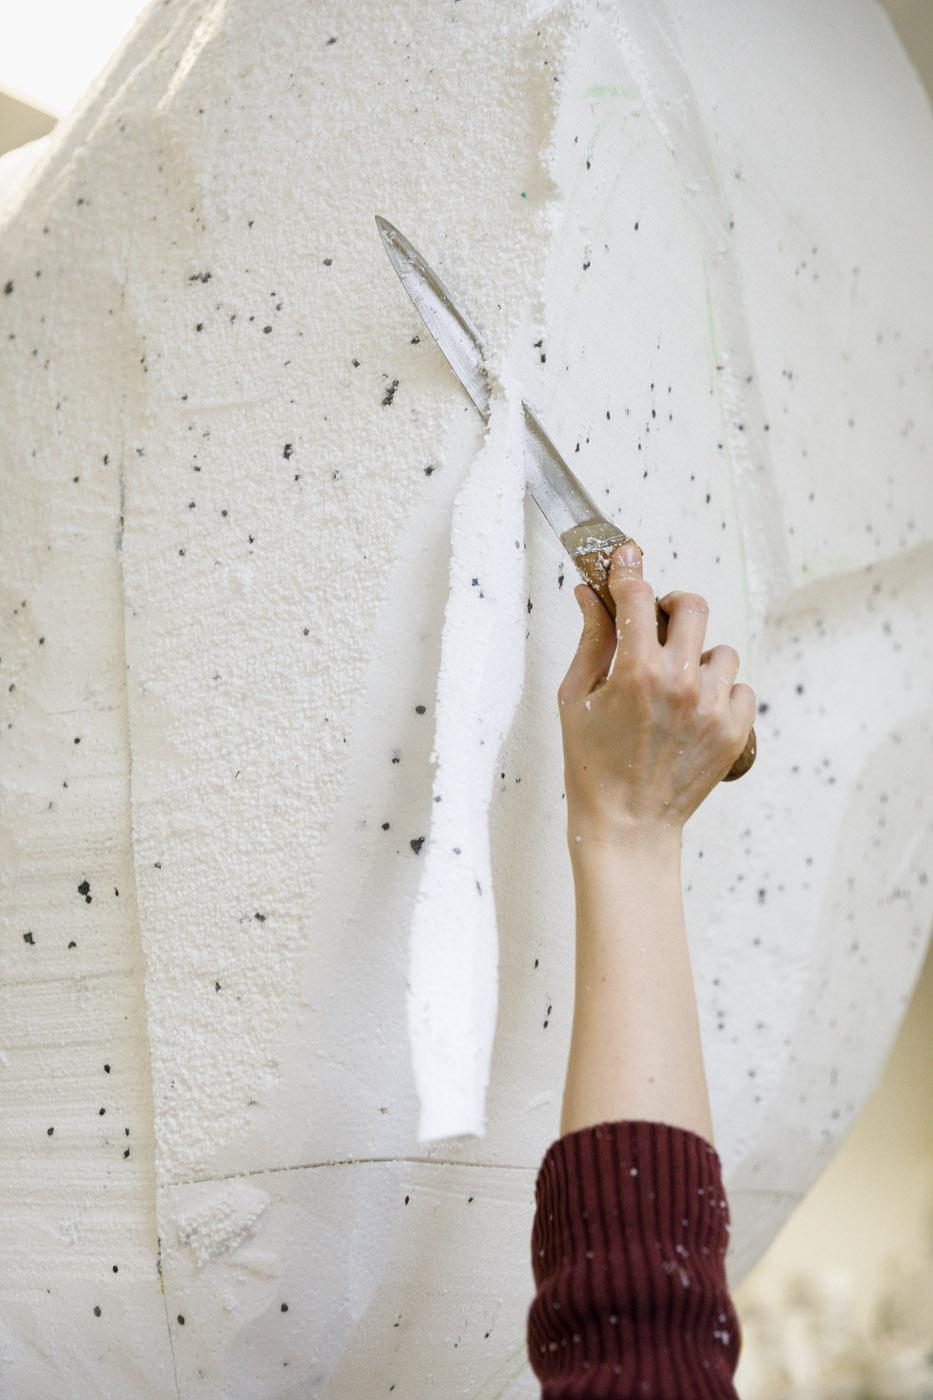 Messer Schnitzen Styropor Skulptur